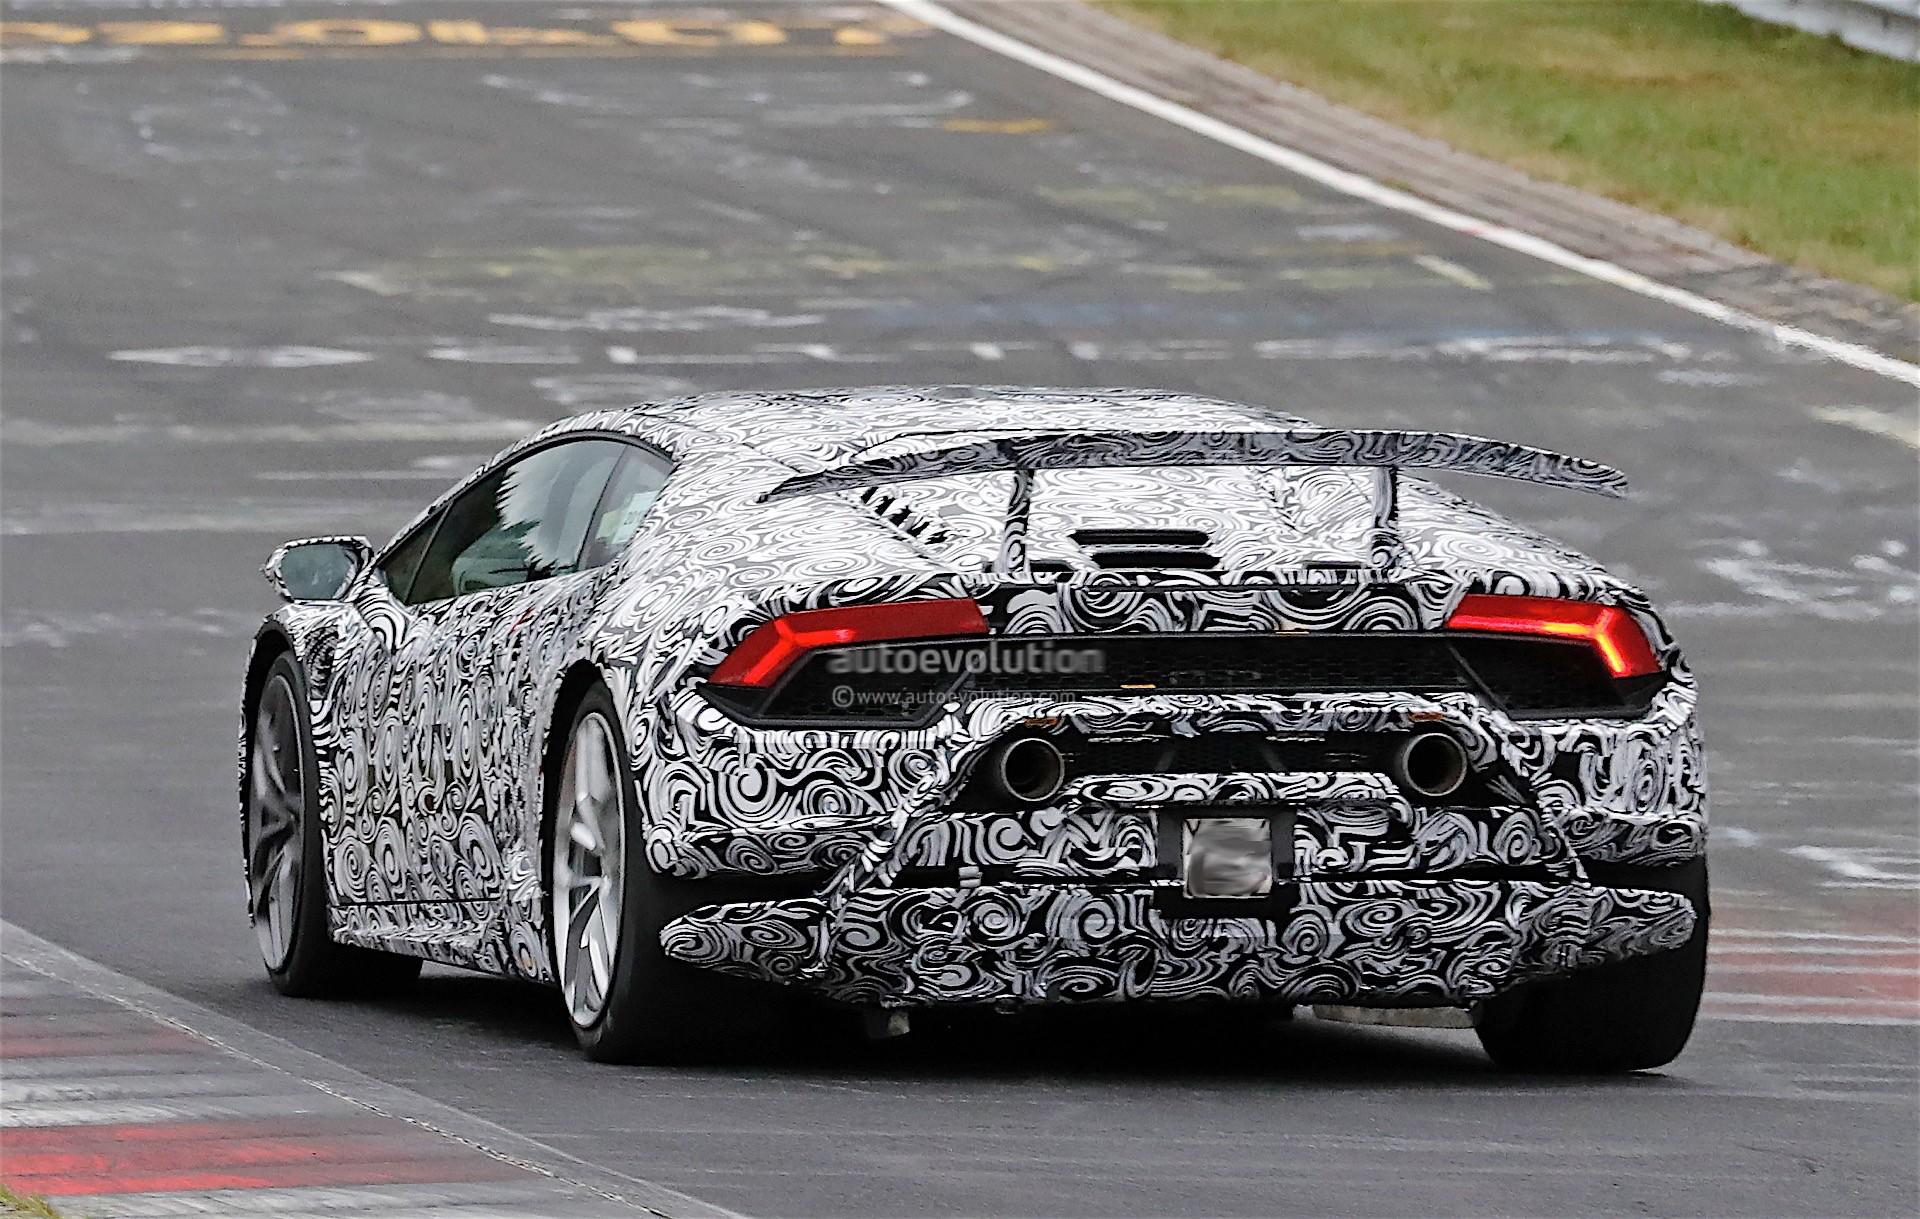 Lamborghini Huracan Performante Previewed In London Nurburgring Lap Mentioned Autoevolution